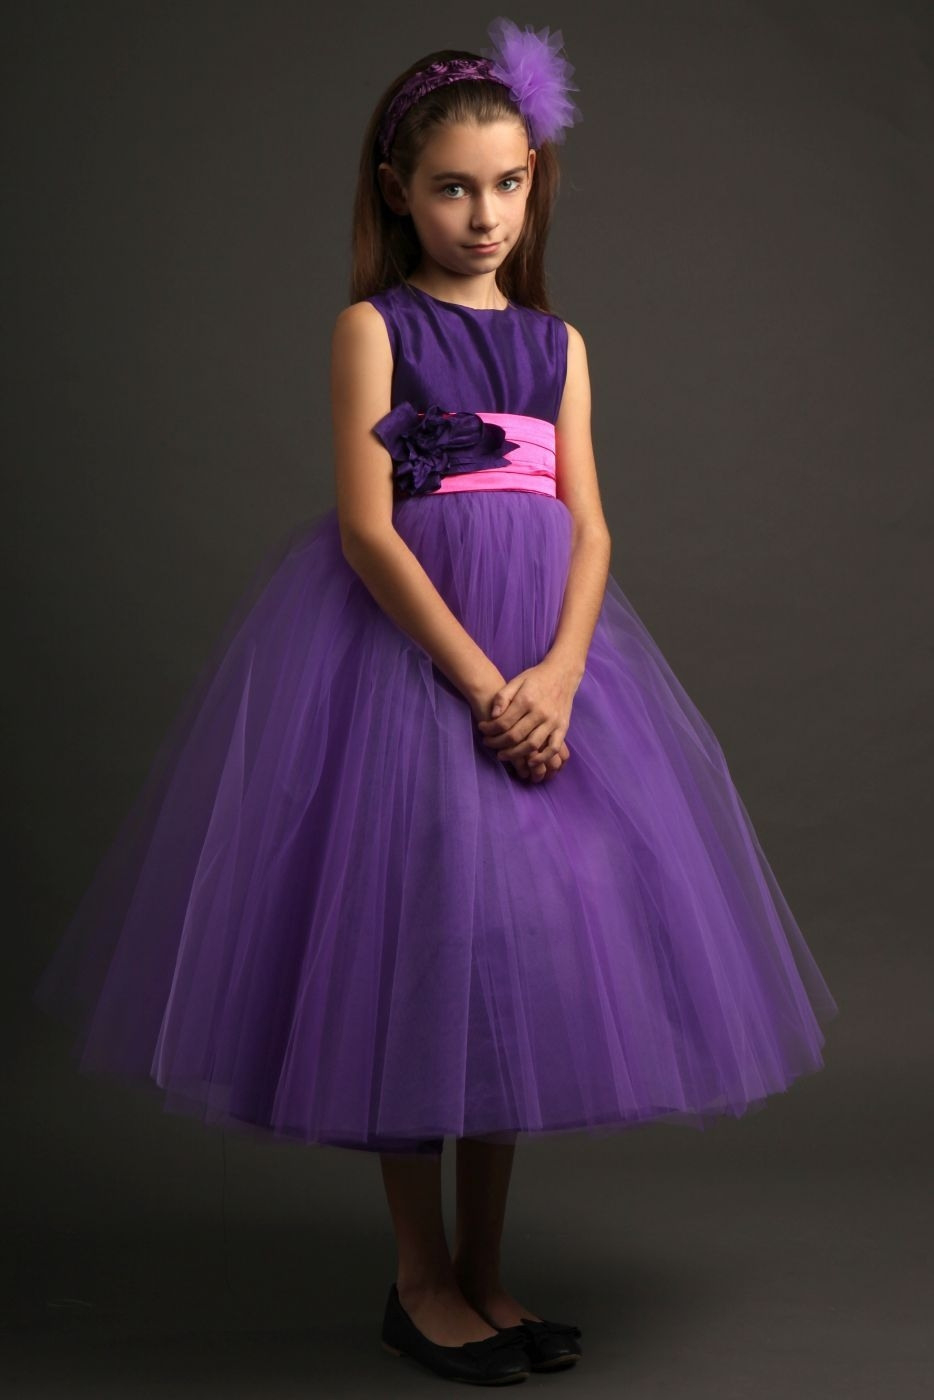 13 Genial Lila Kleid Festlich Vertrieb - Abendkleid